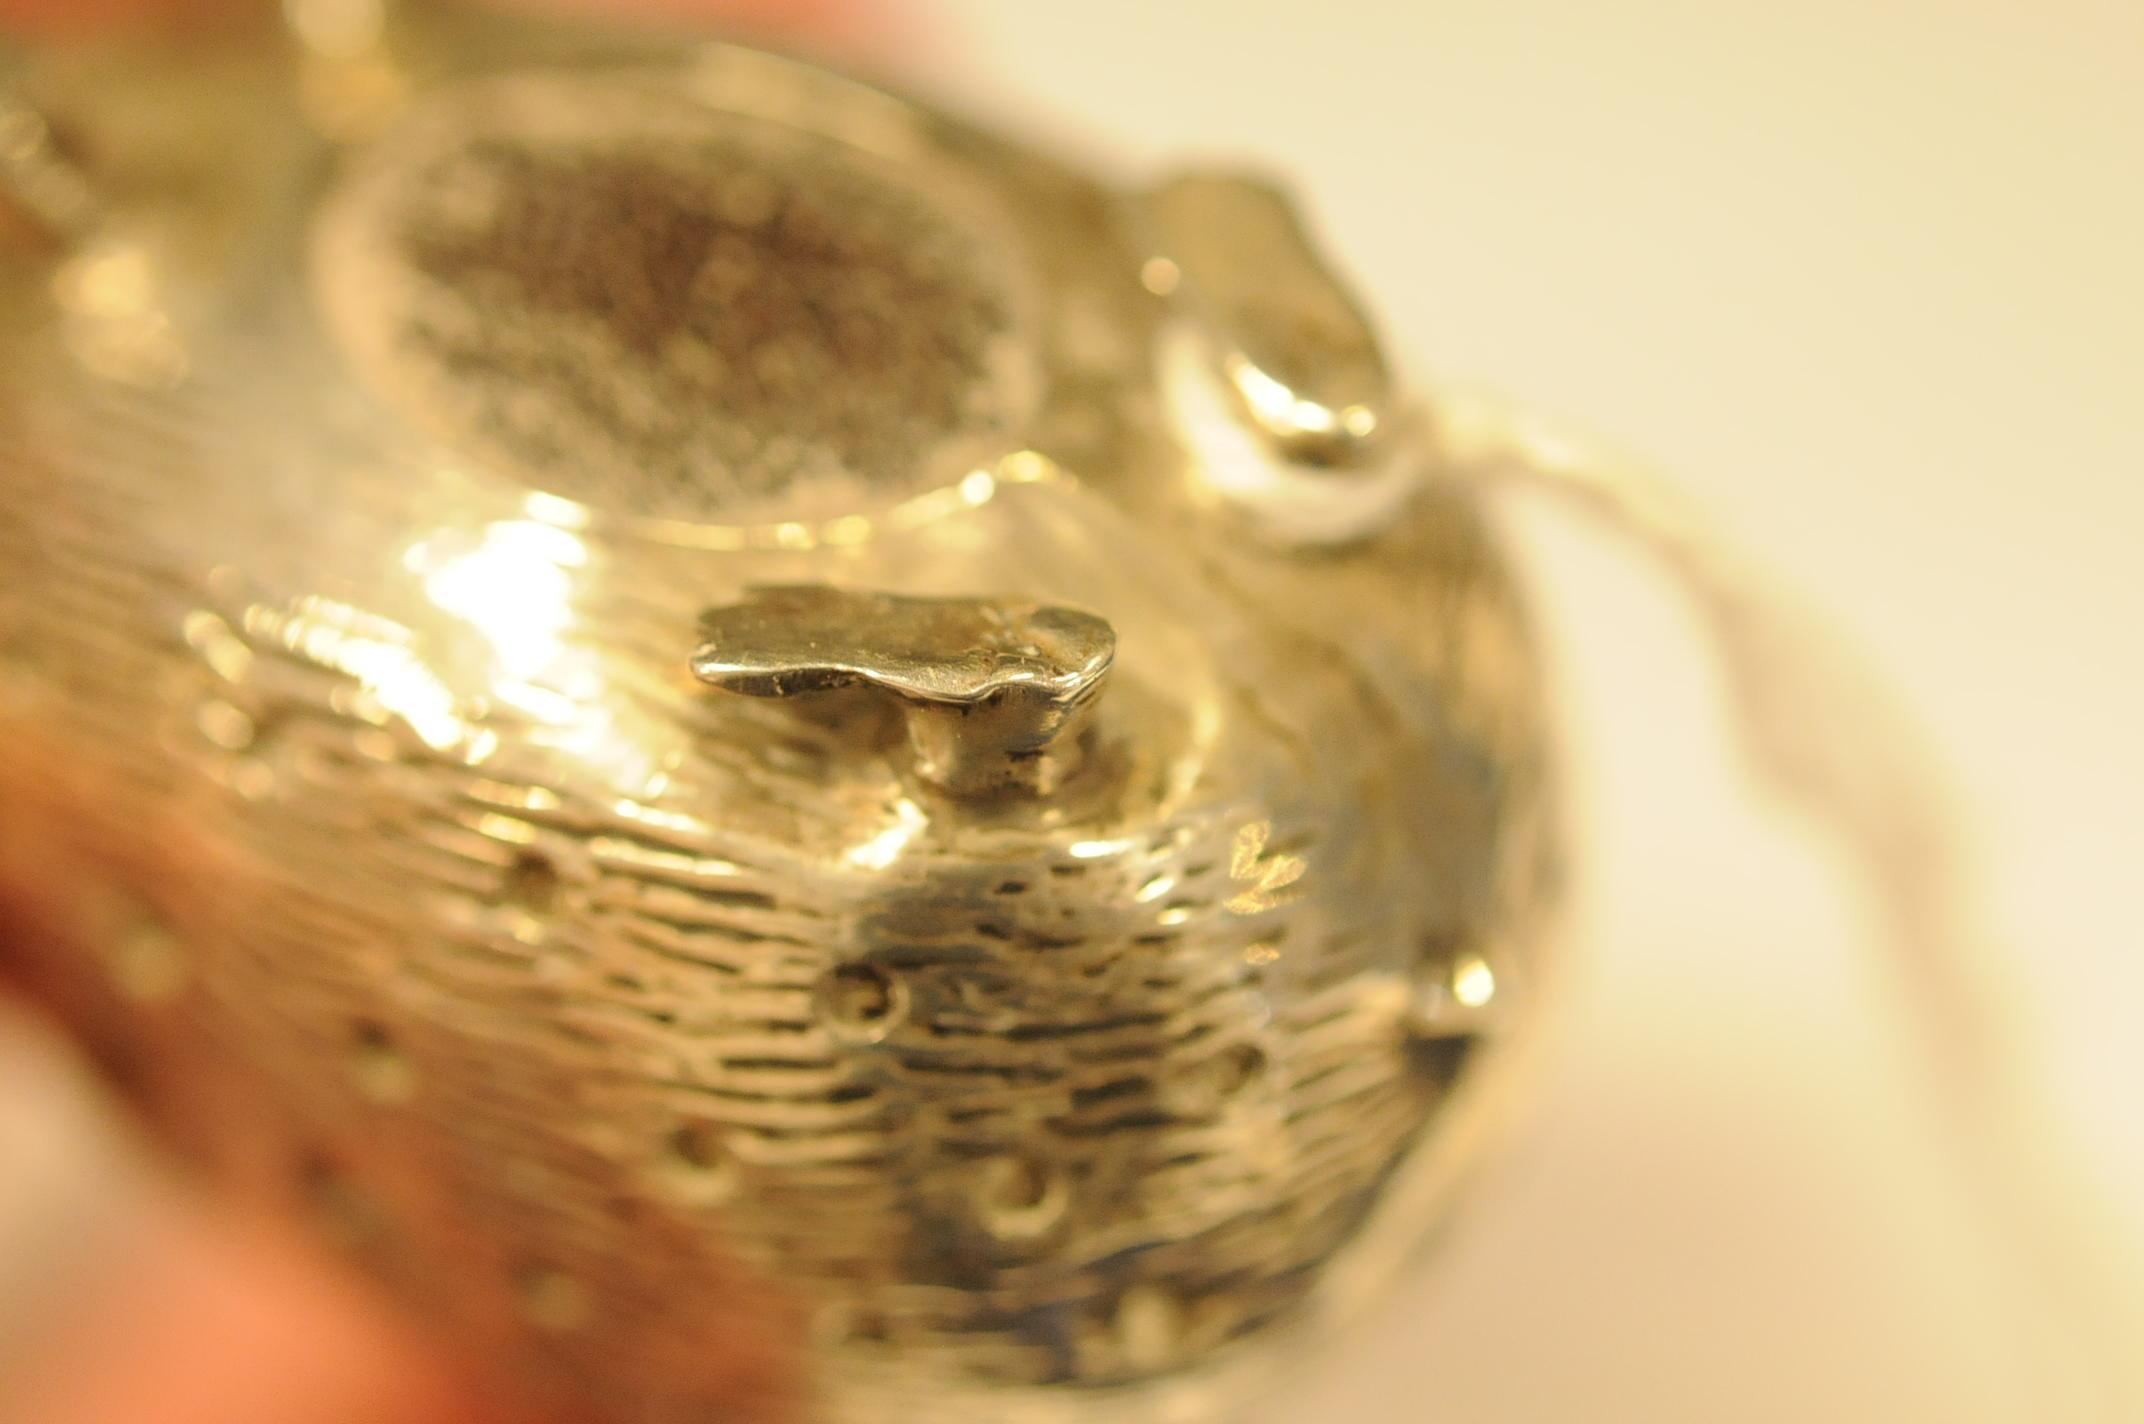 Lot 39 - An Edwardian silver novelty pin cushion by L&S, modelled as a hedgehog, Birmingham 1907